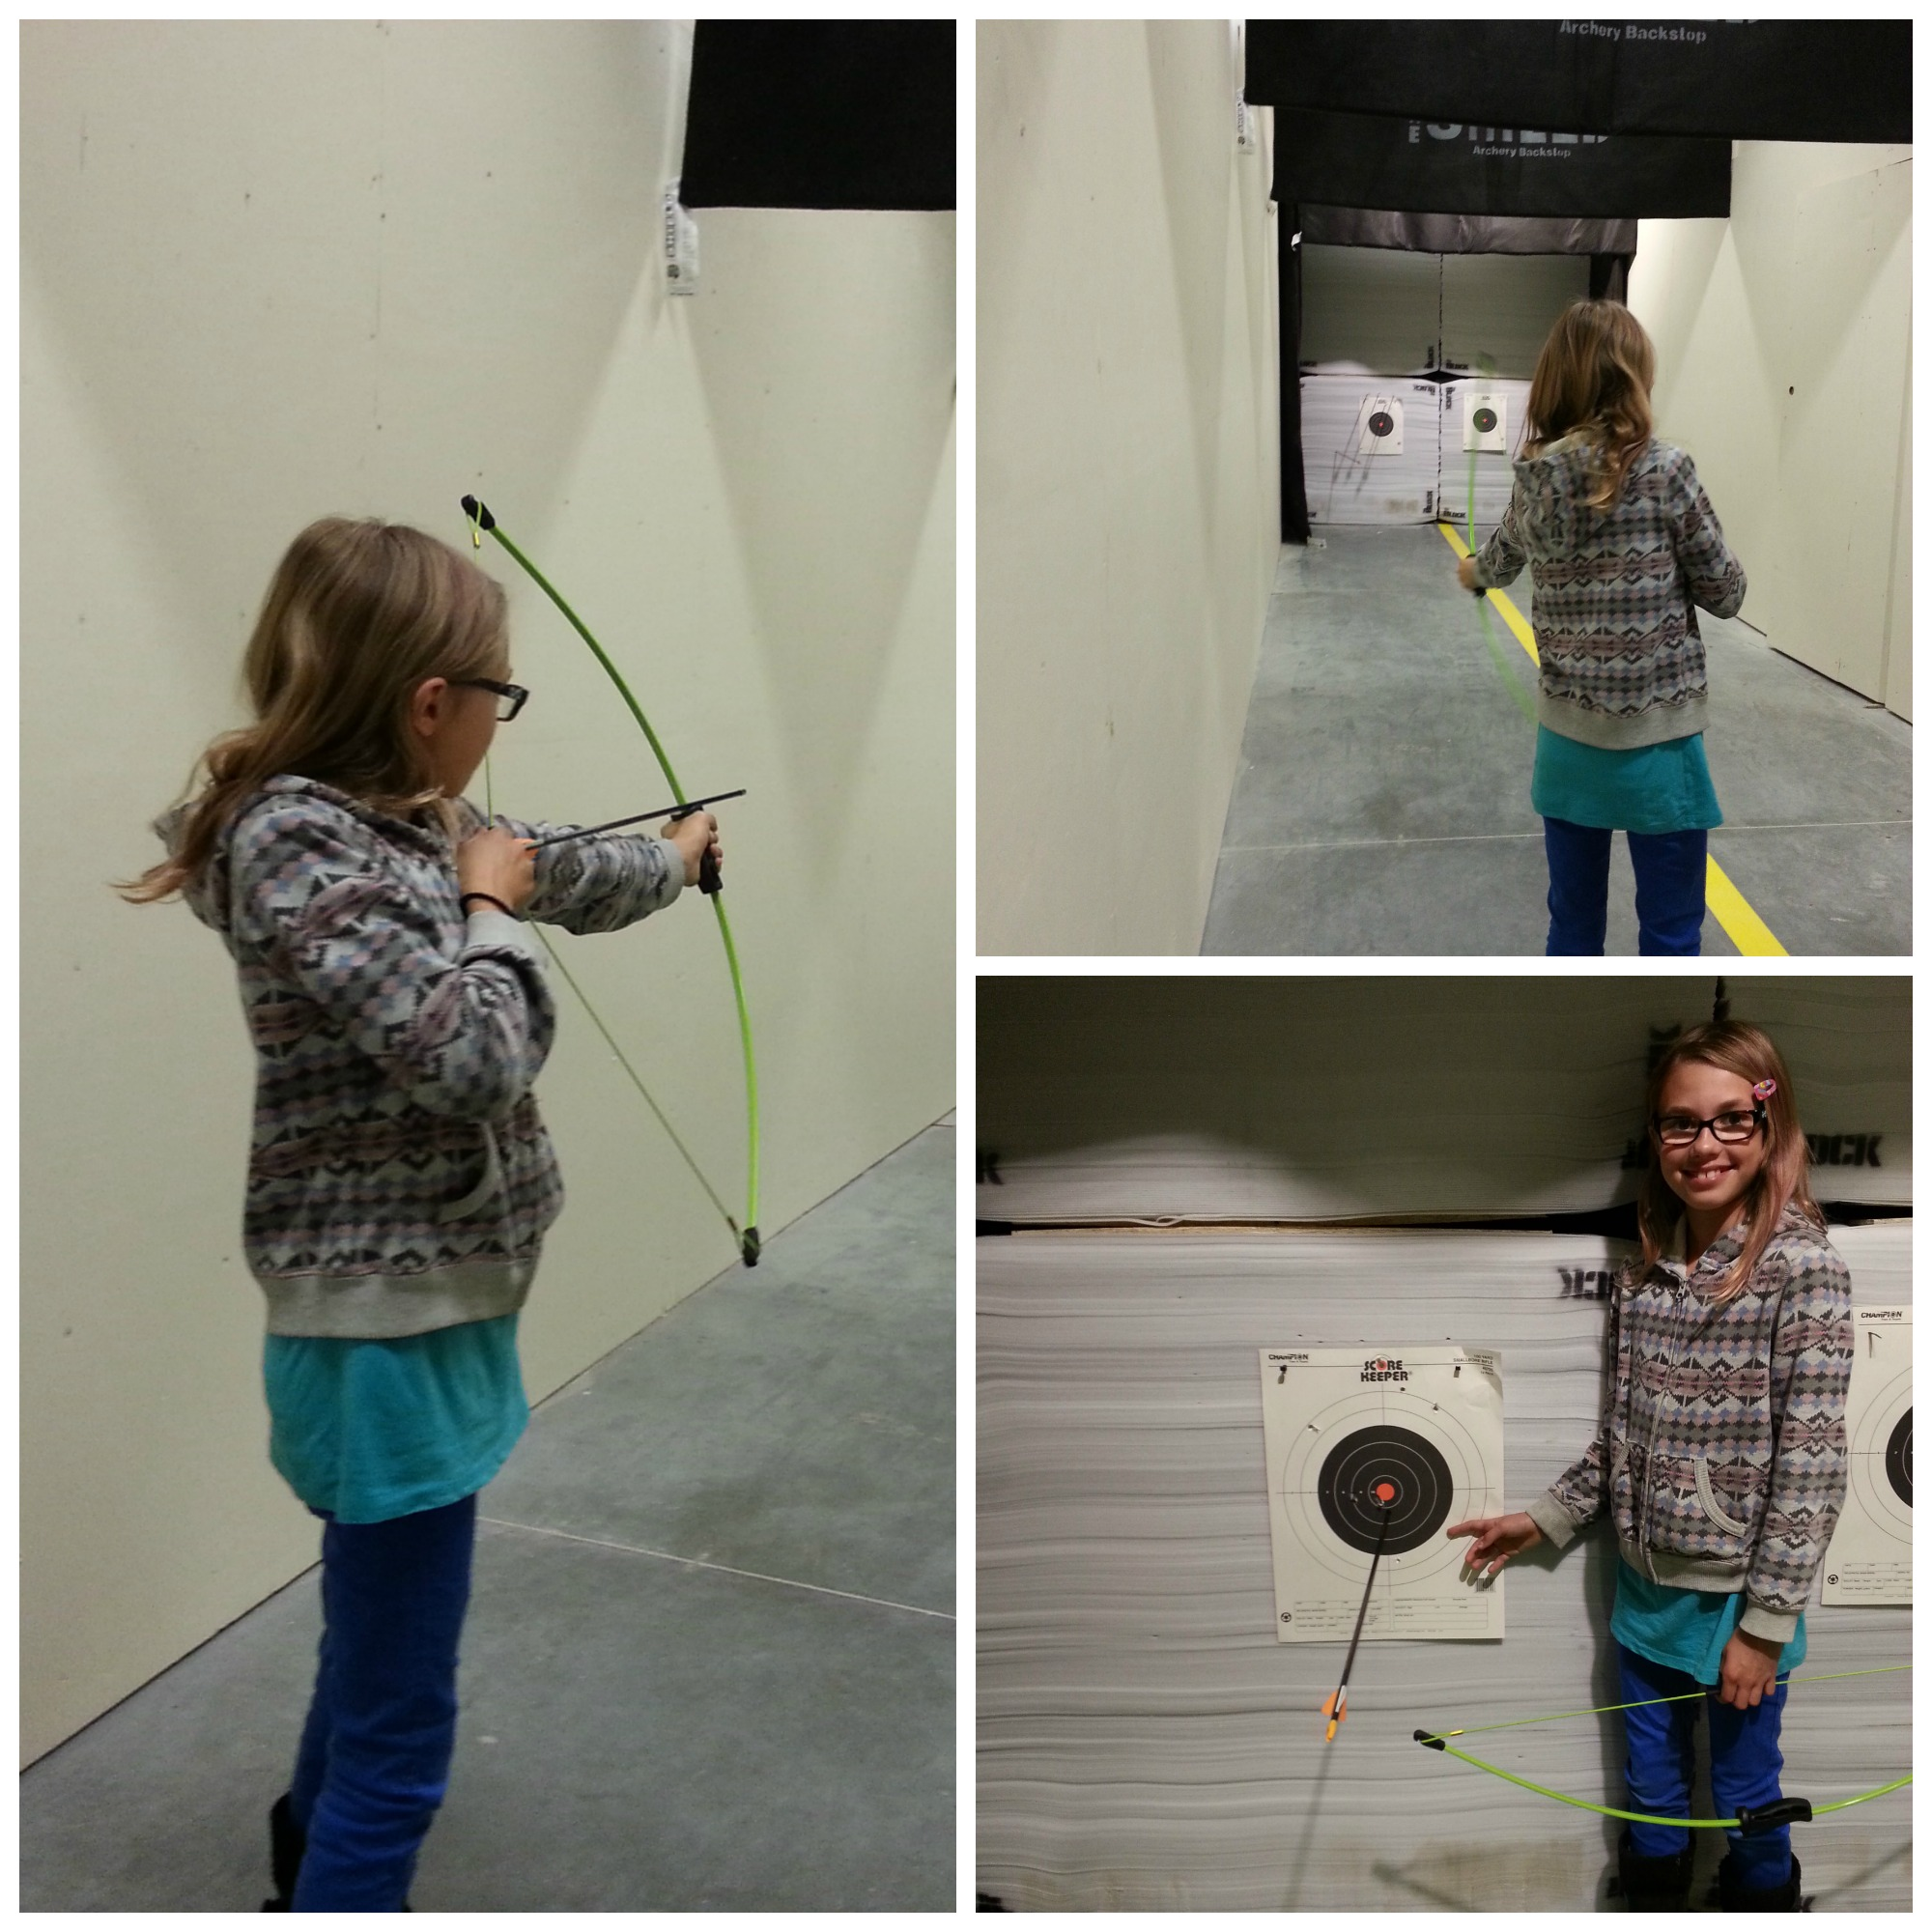 Cabela's Archery Range Calgary